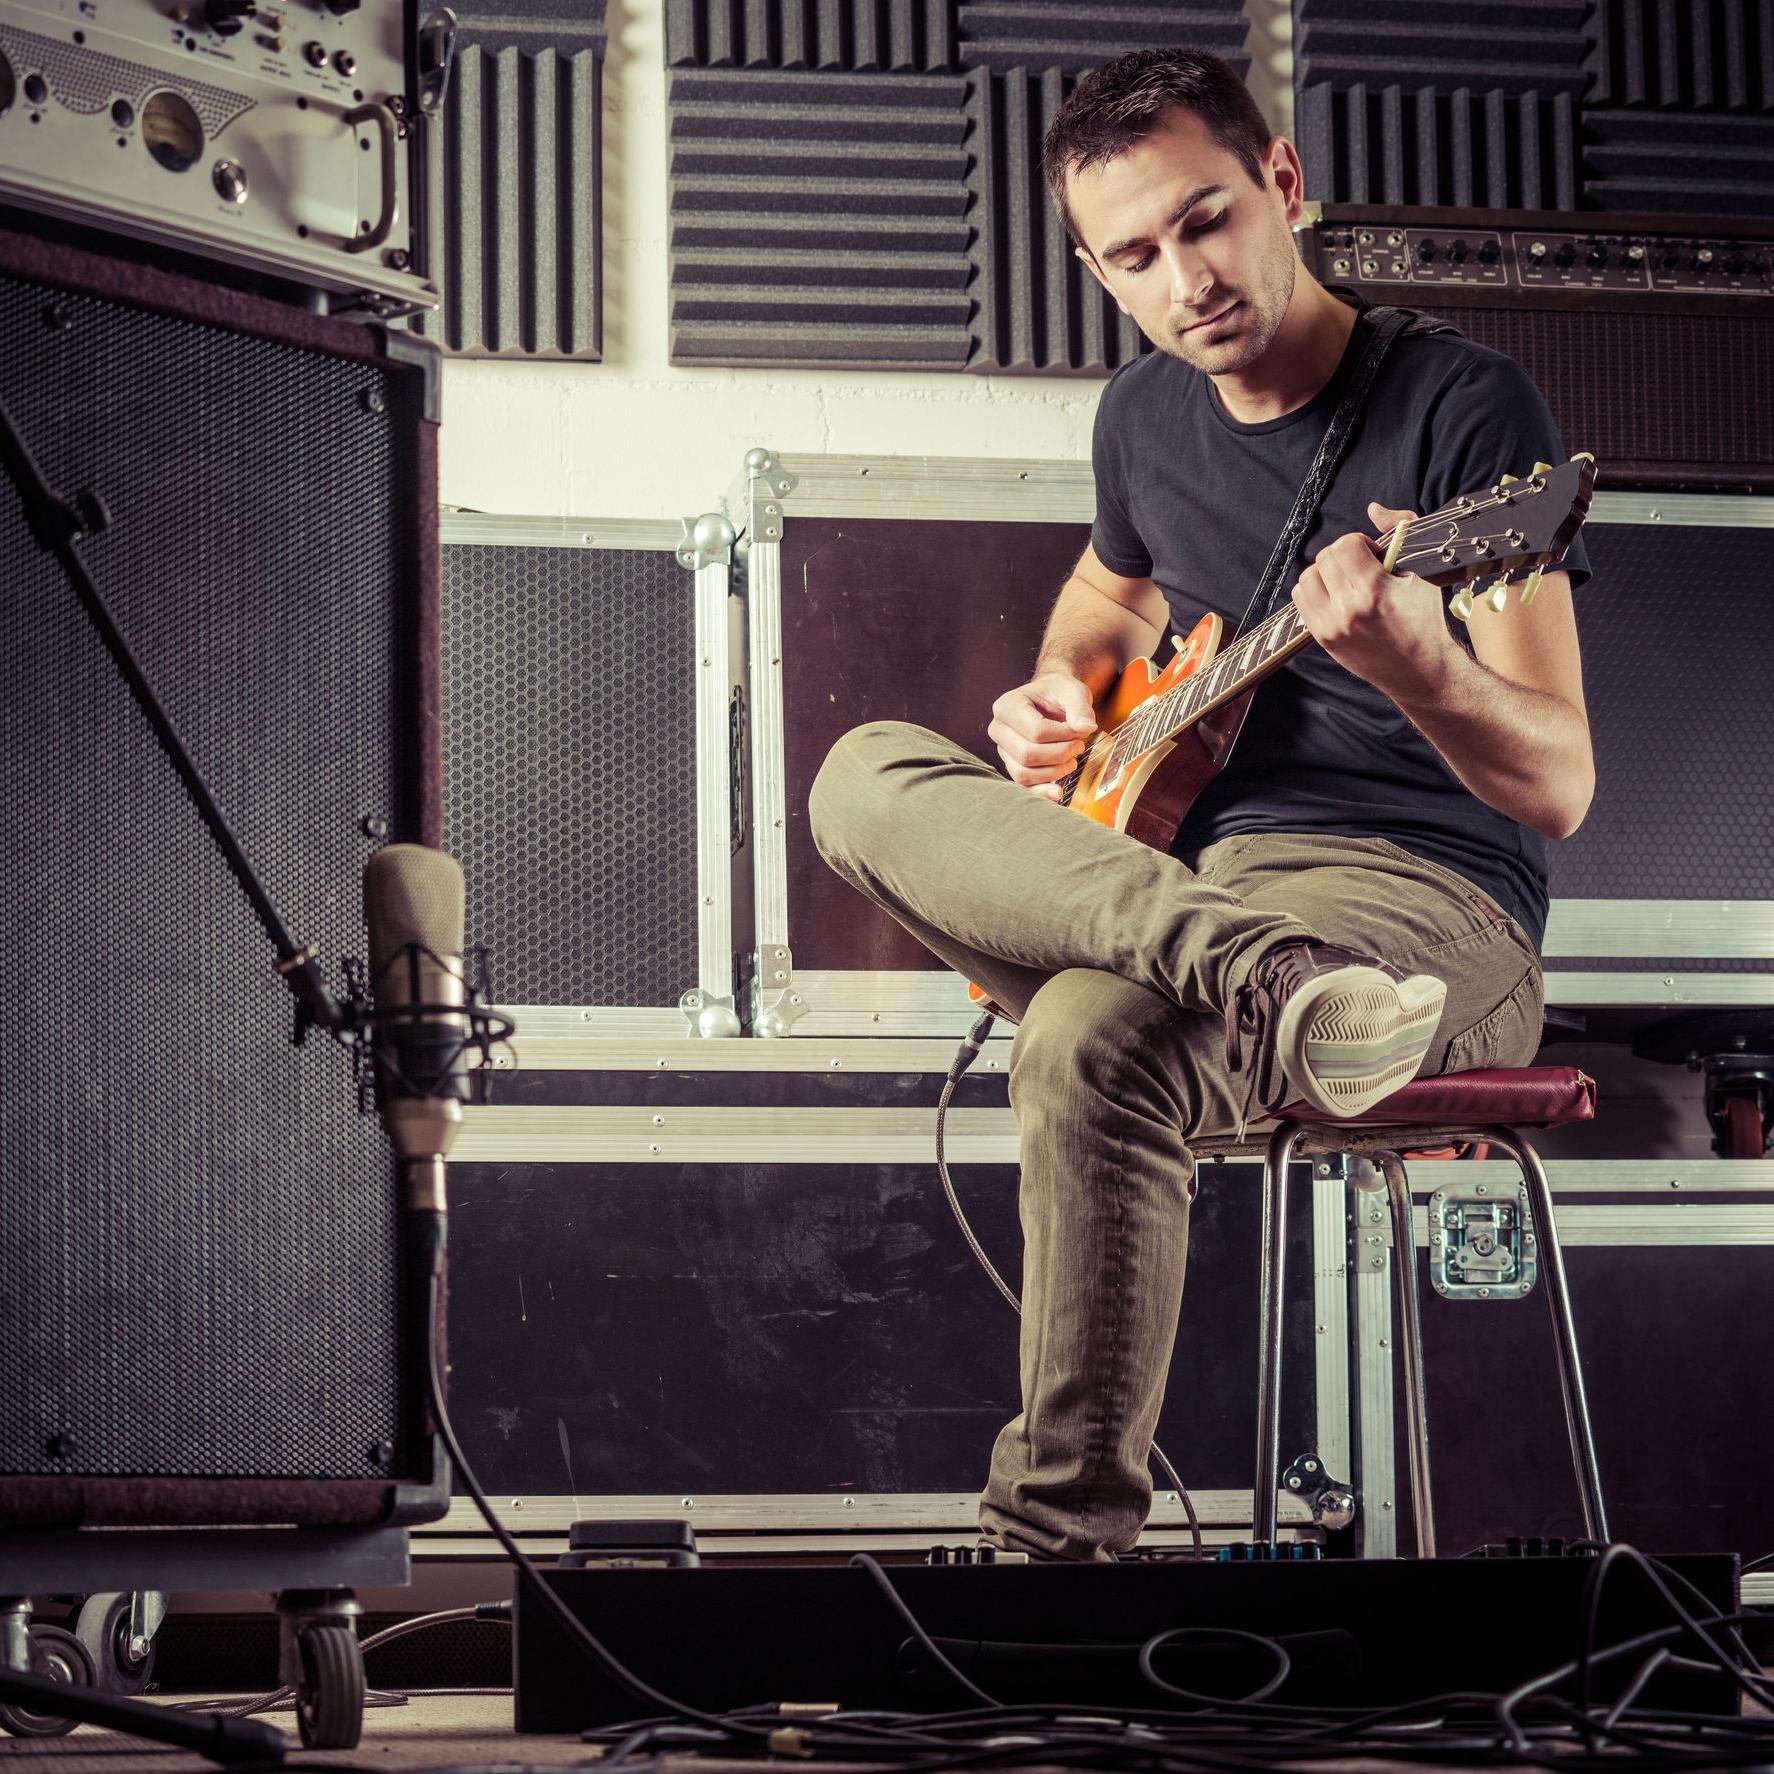 musician-sq.jpg